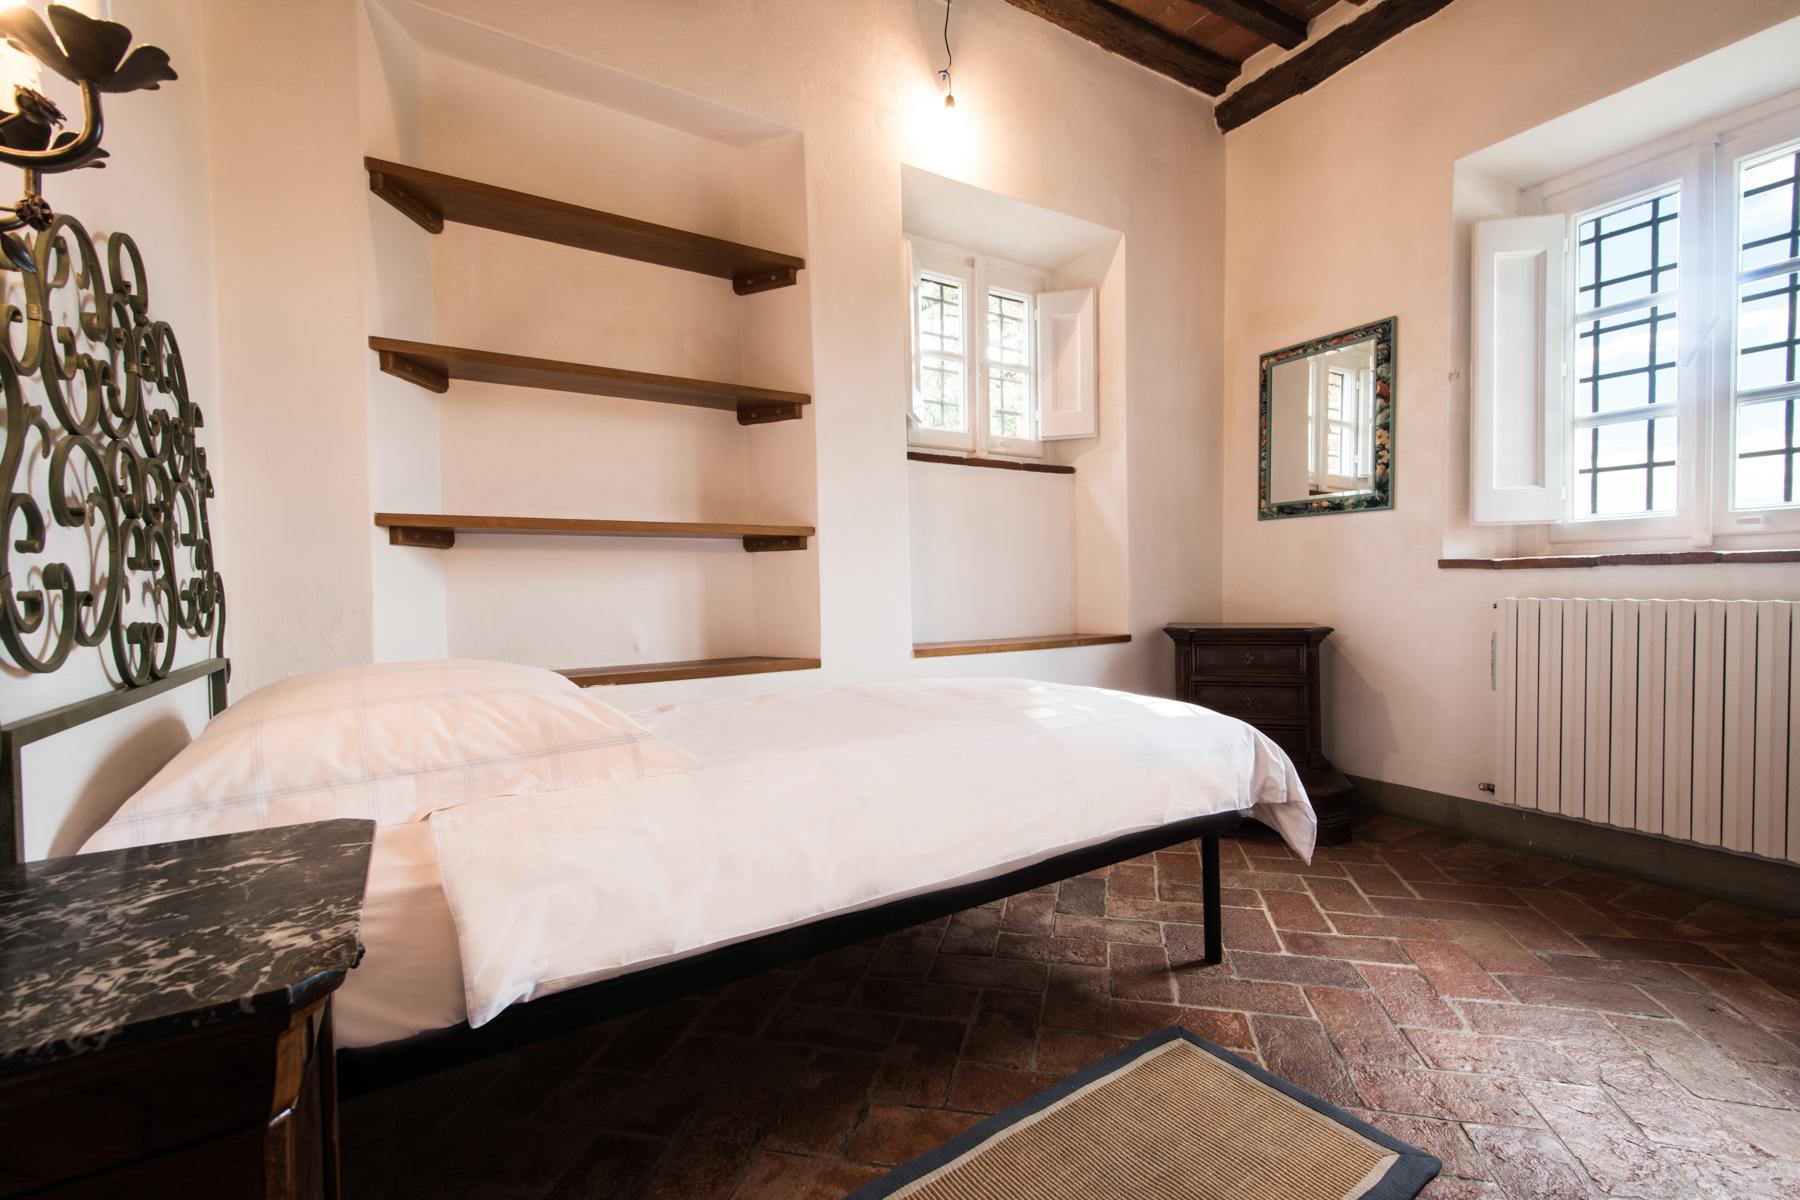 Villa in Vendita a Lucca: 5 locali, 1065 mq - Foto 22